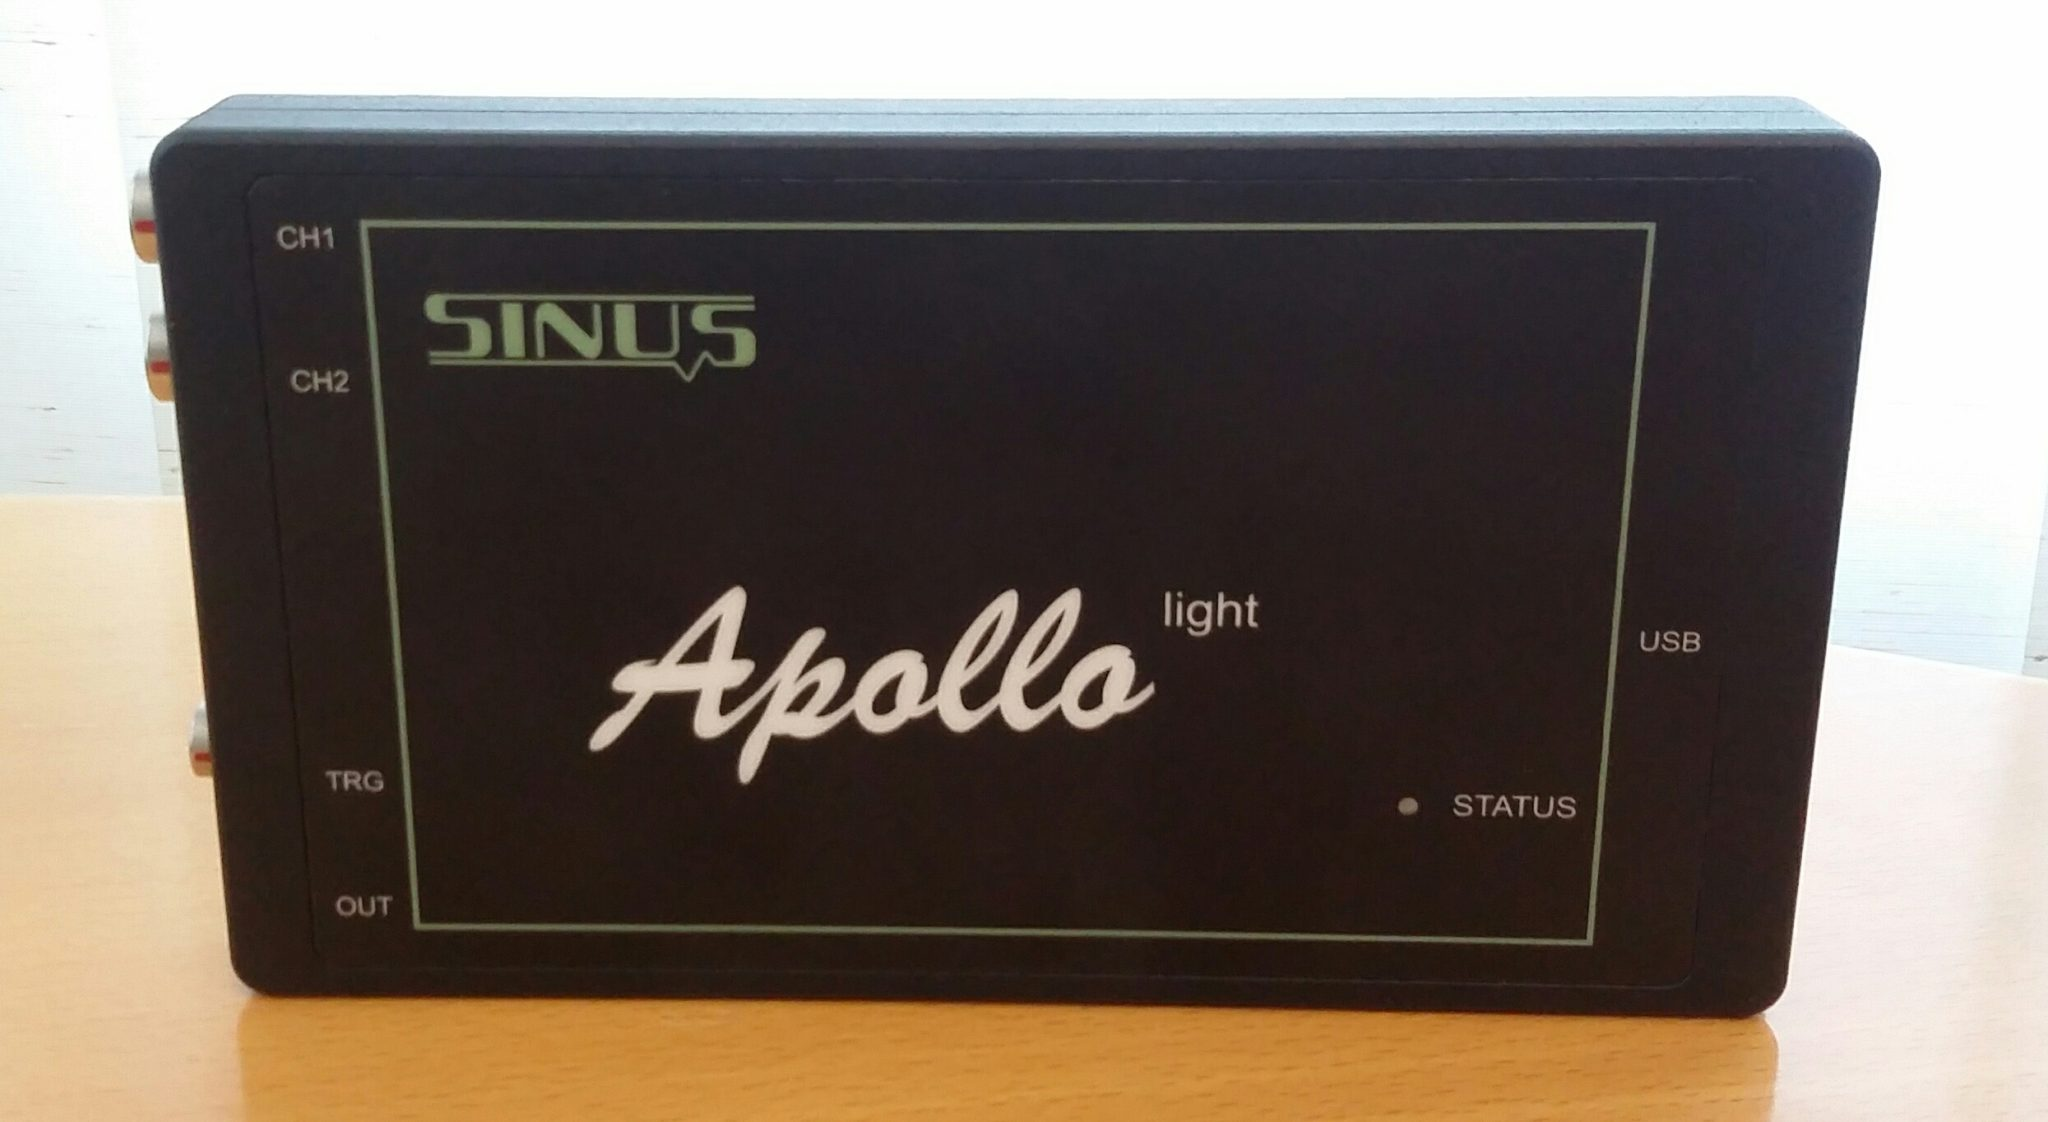 Apollo Light